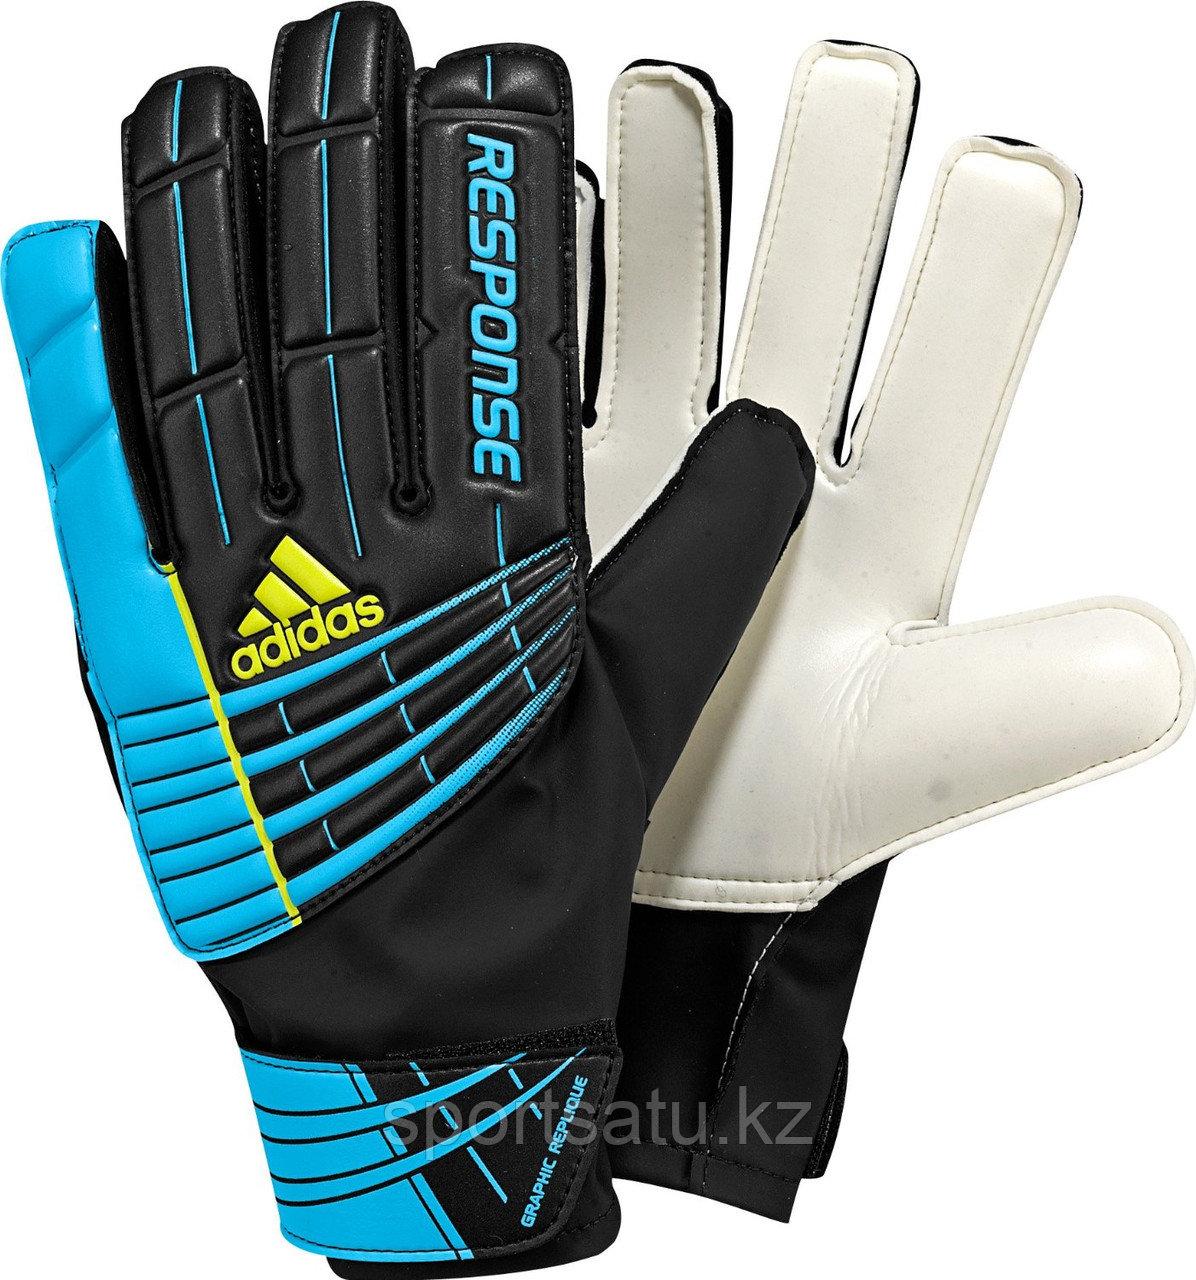 Вратарские перчатки оригинал ADIDAS PREDATOR